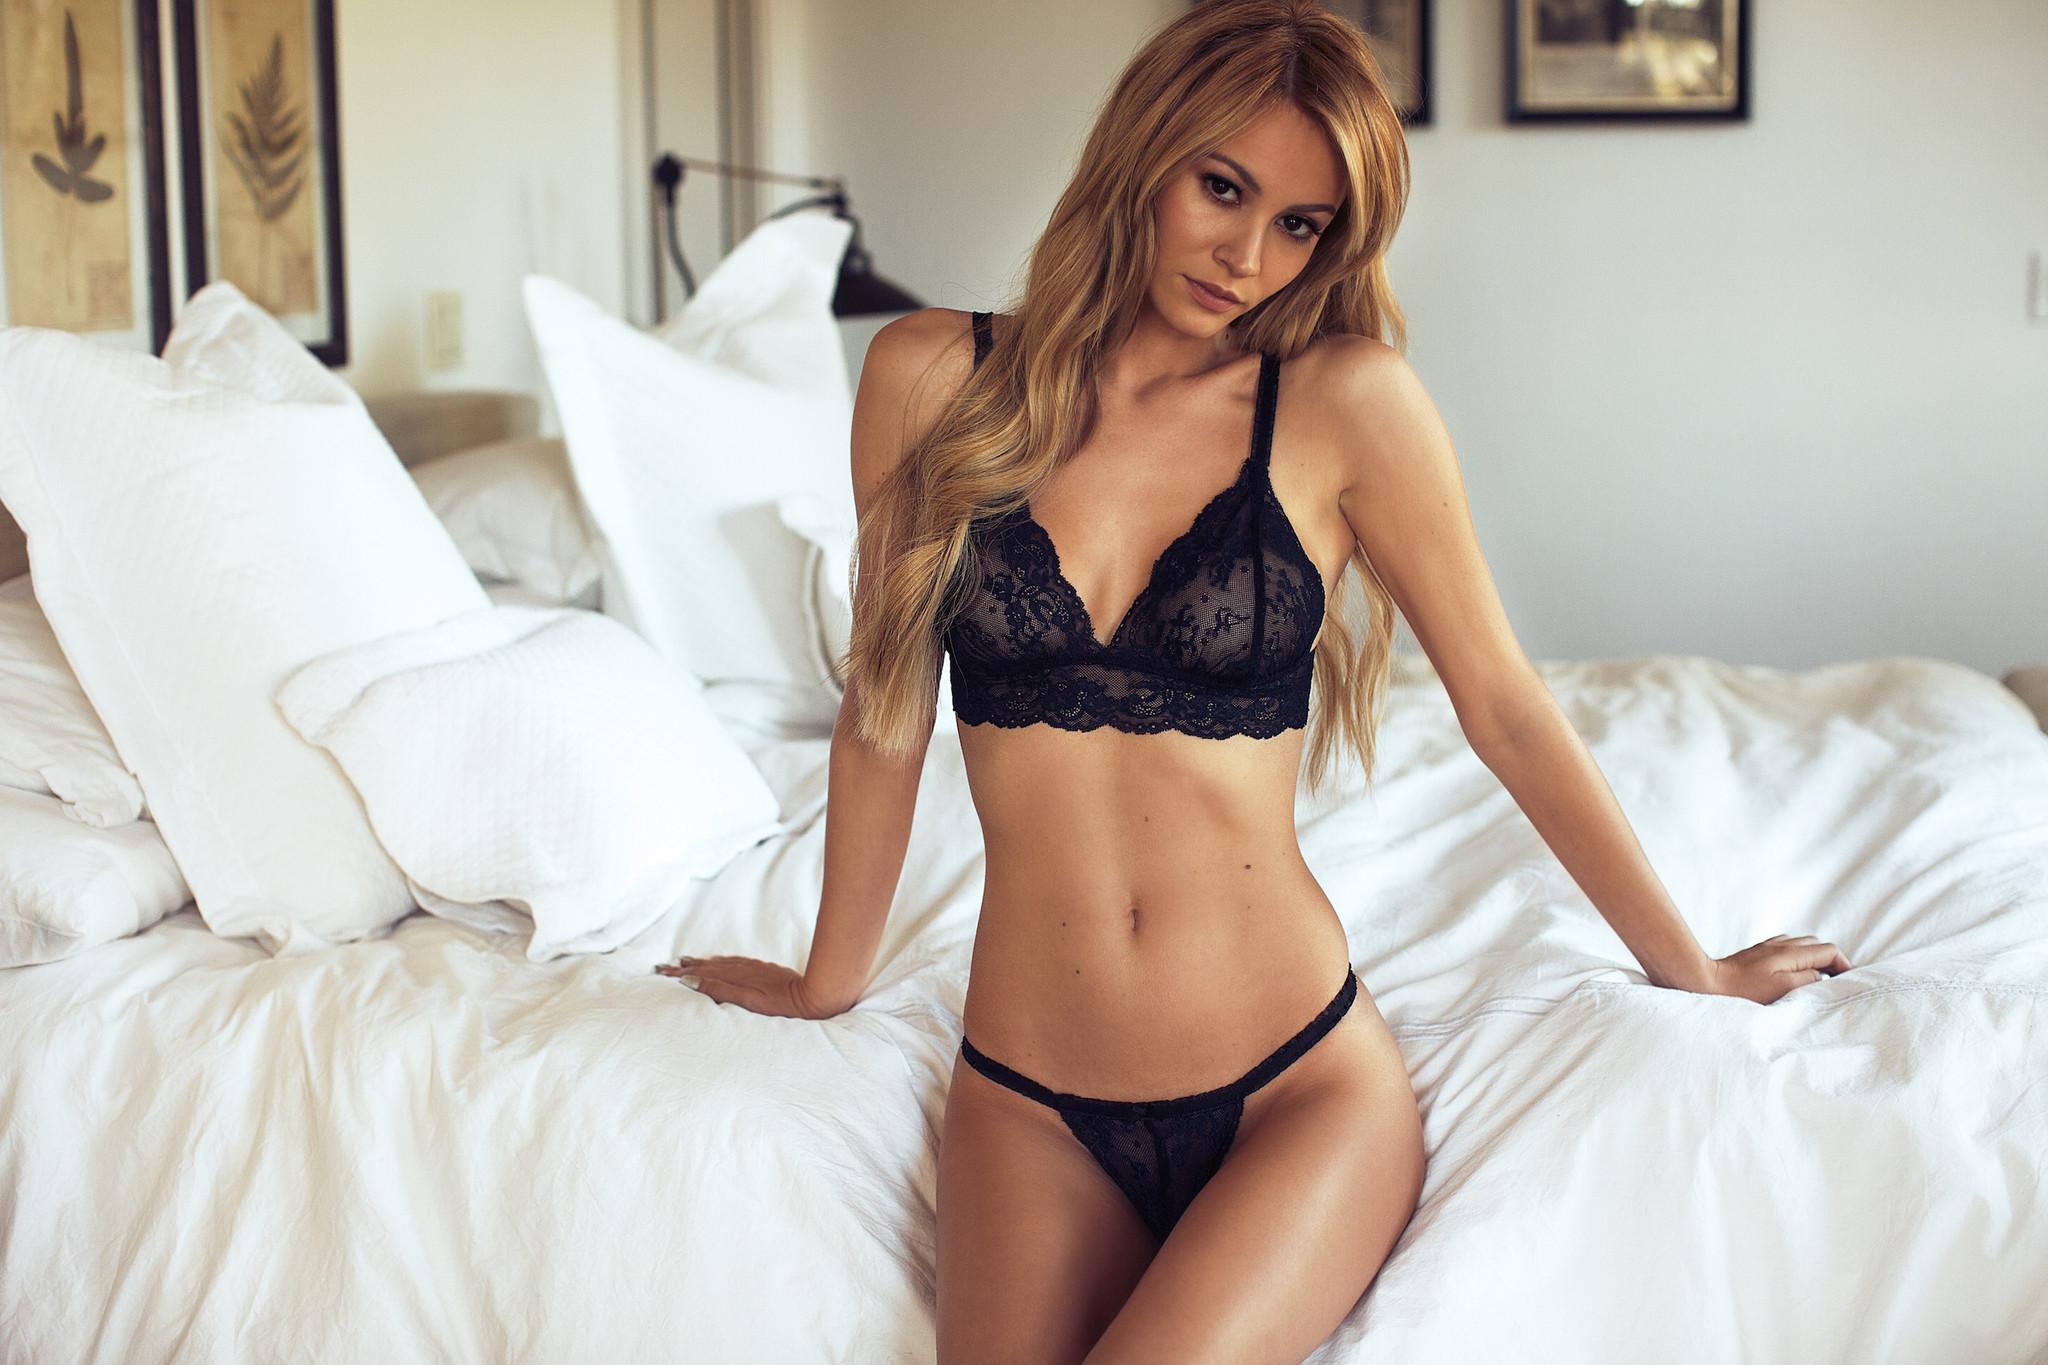 Bryana Holly Widescreen